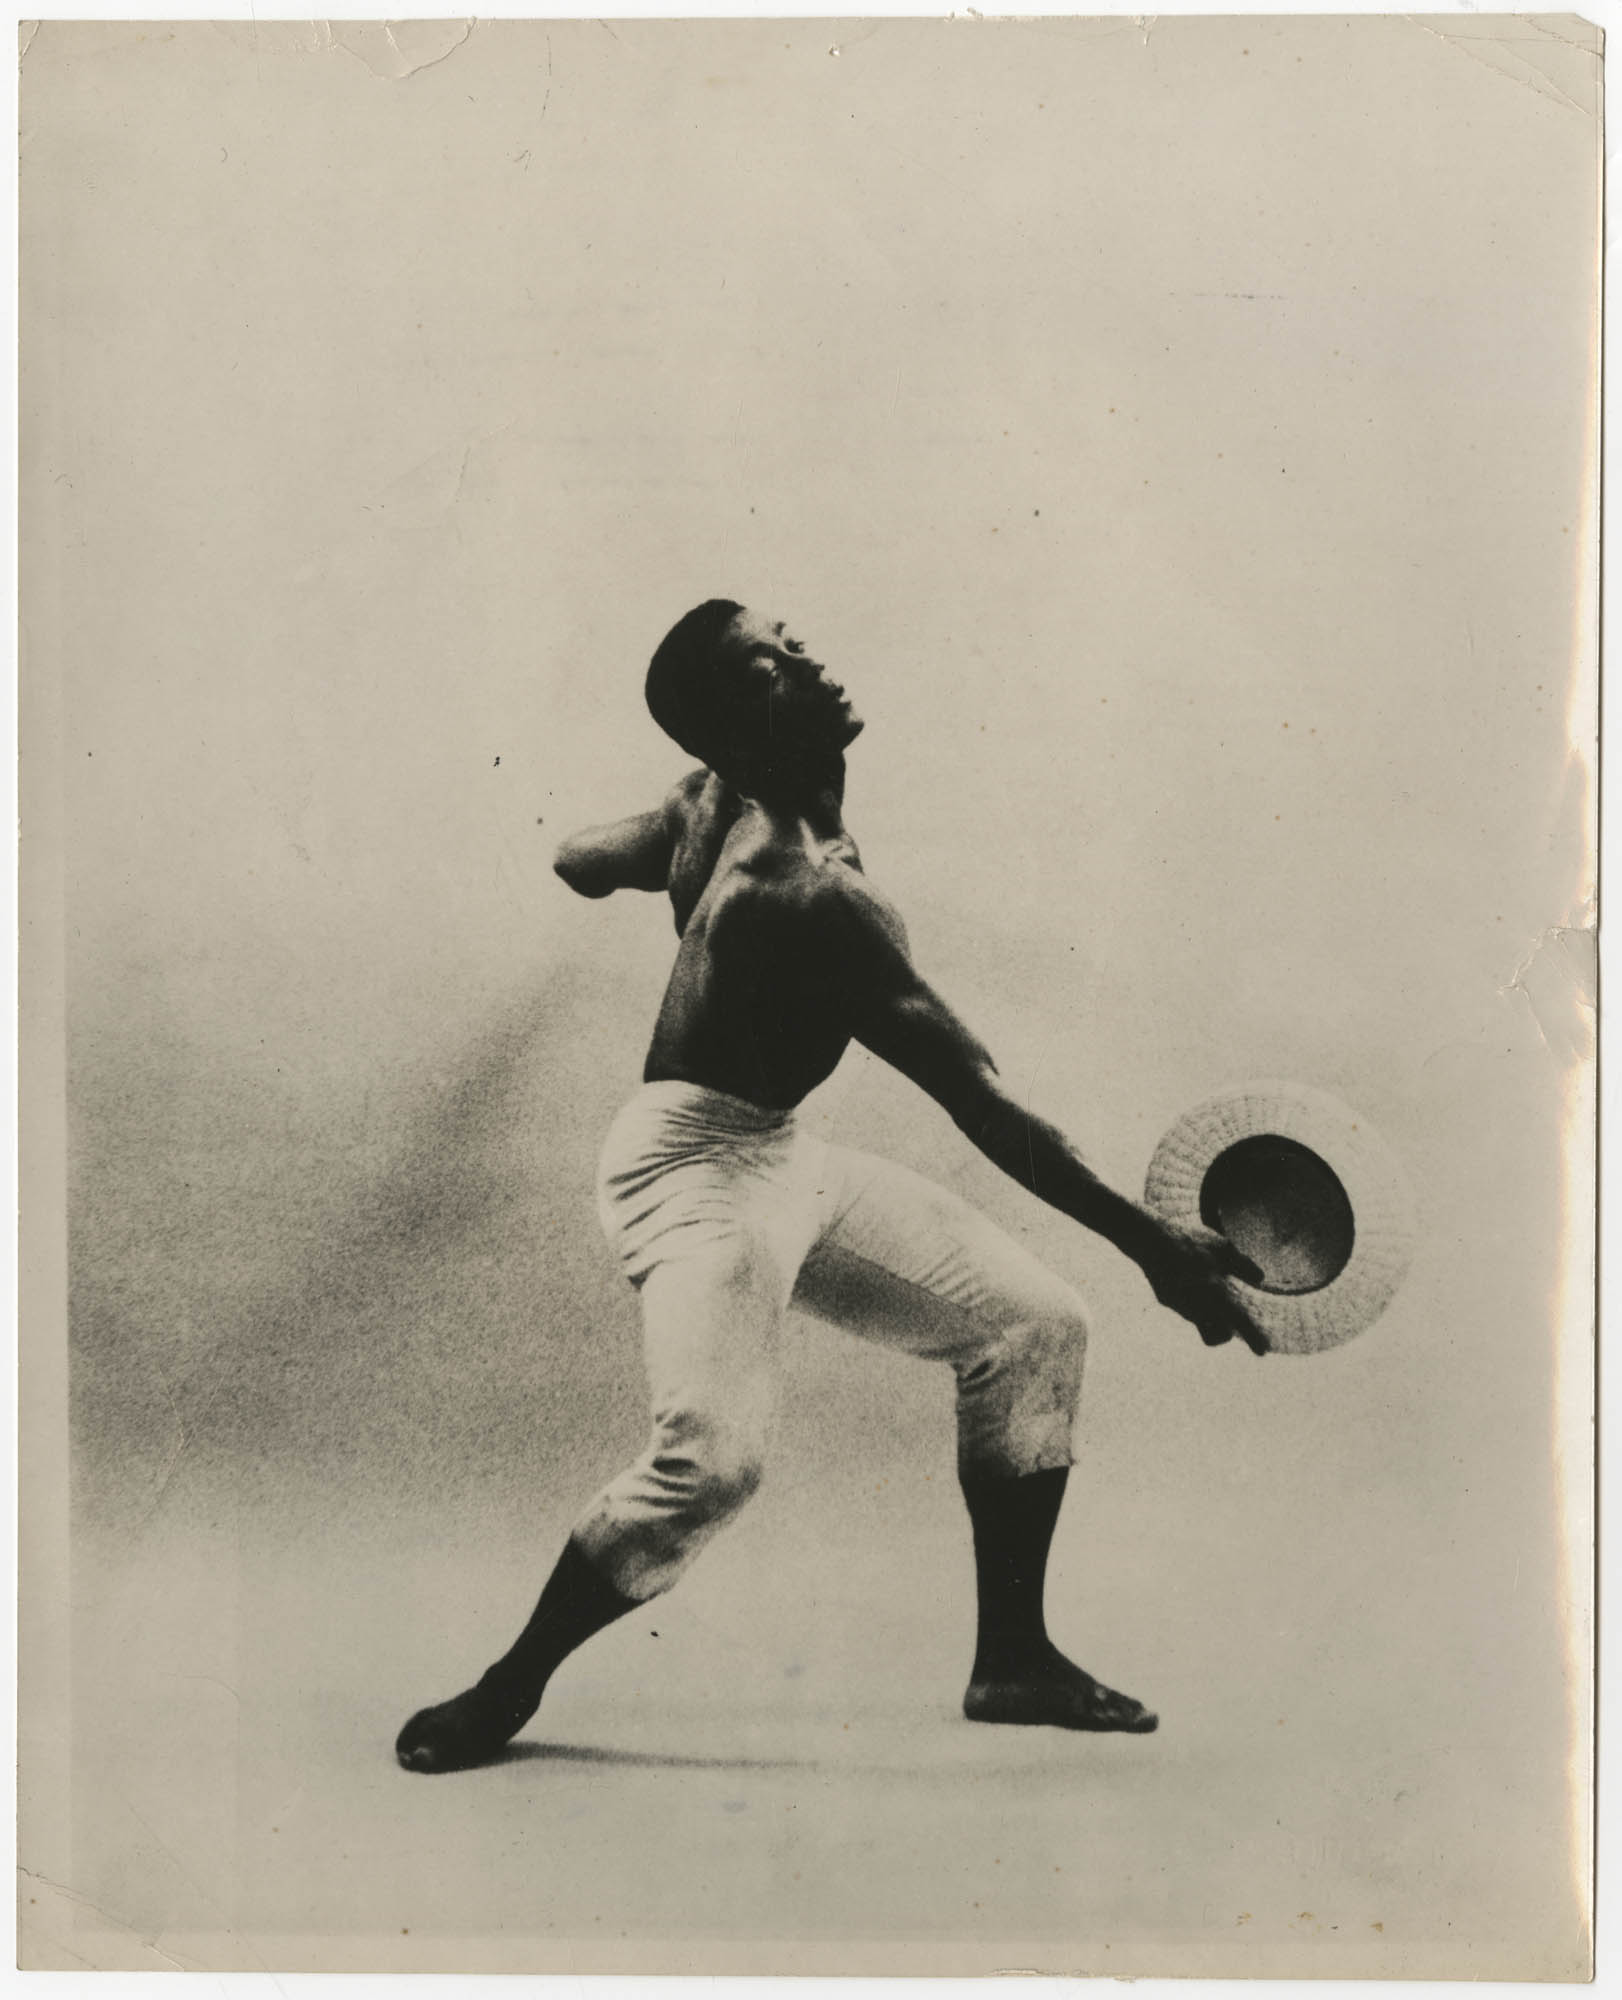 Photograph of a Man Dancing